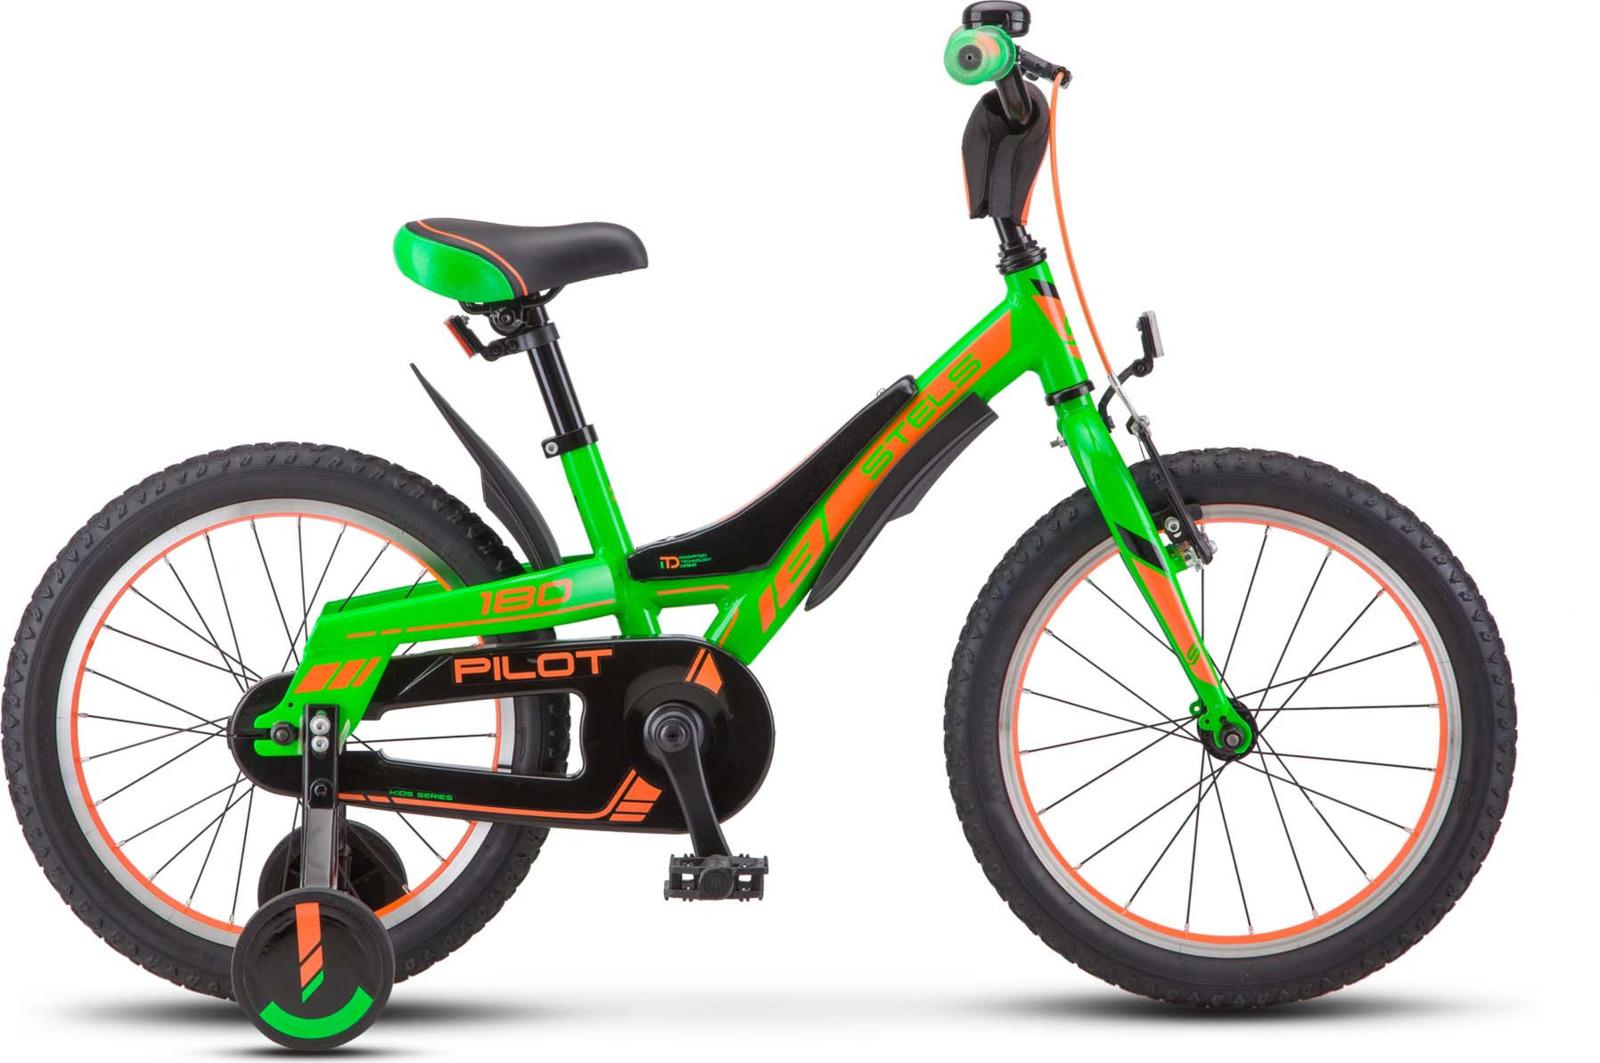 Фото - Велосипед Stels Pilot-180 16, KUBC0046952018, зеленый stels pilot 750 24 16